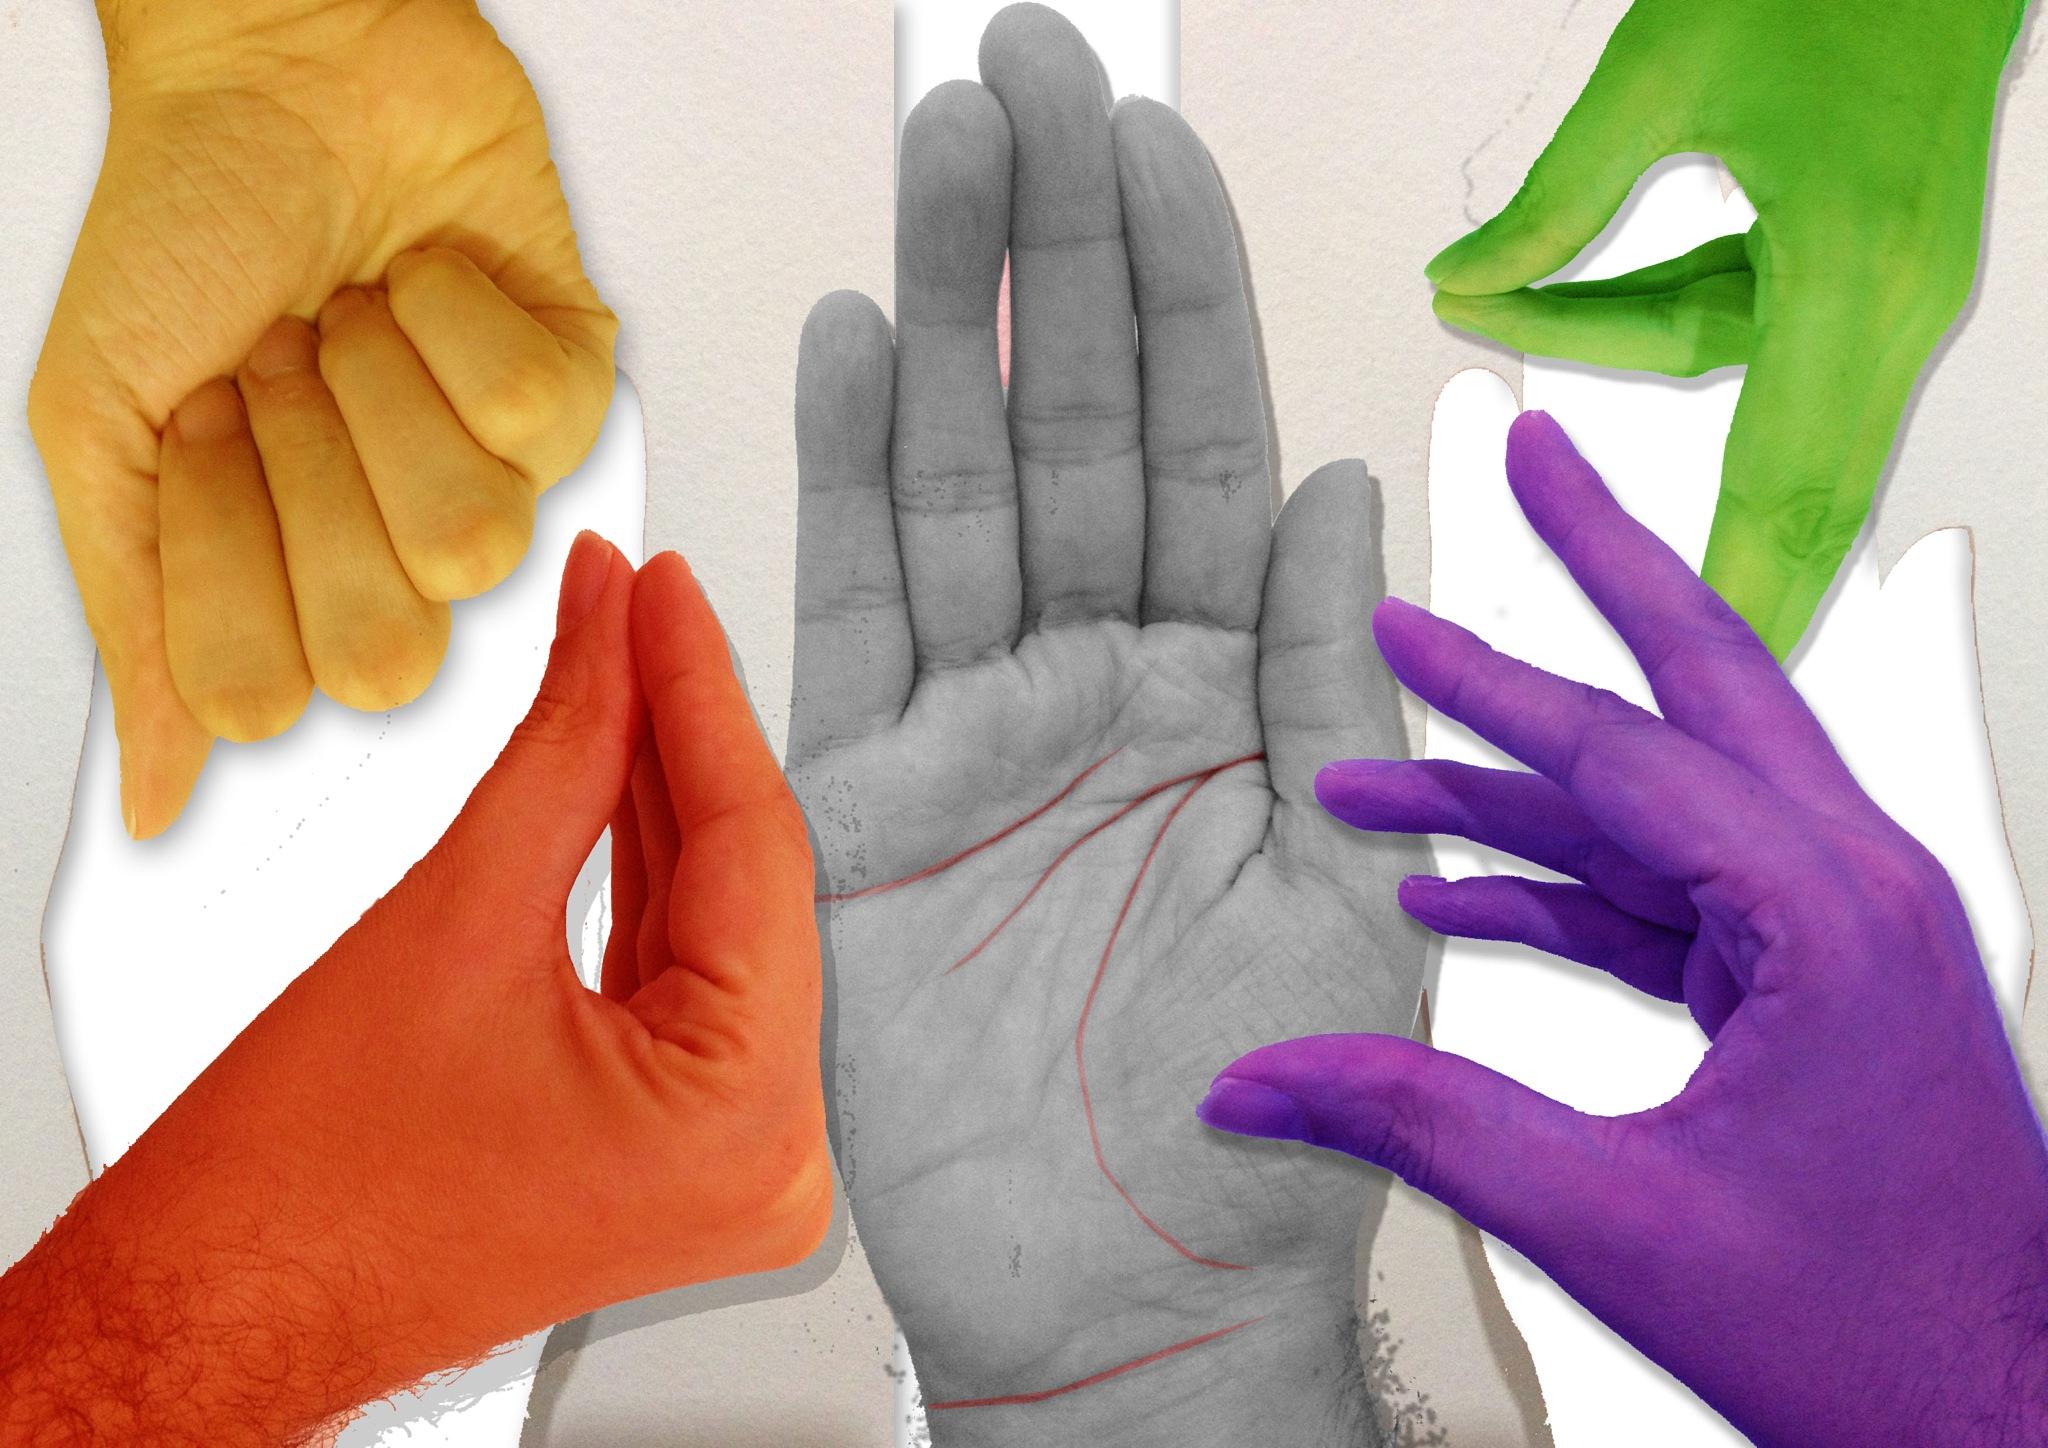 Color Hands by fernandopazalv